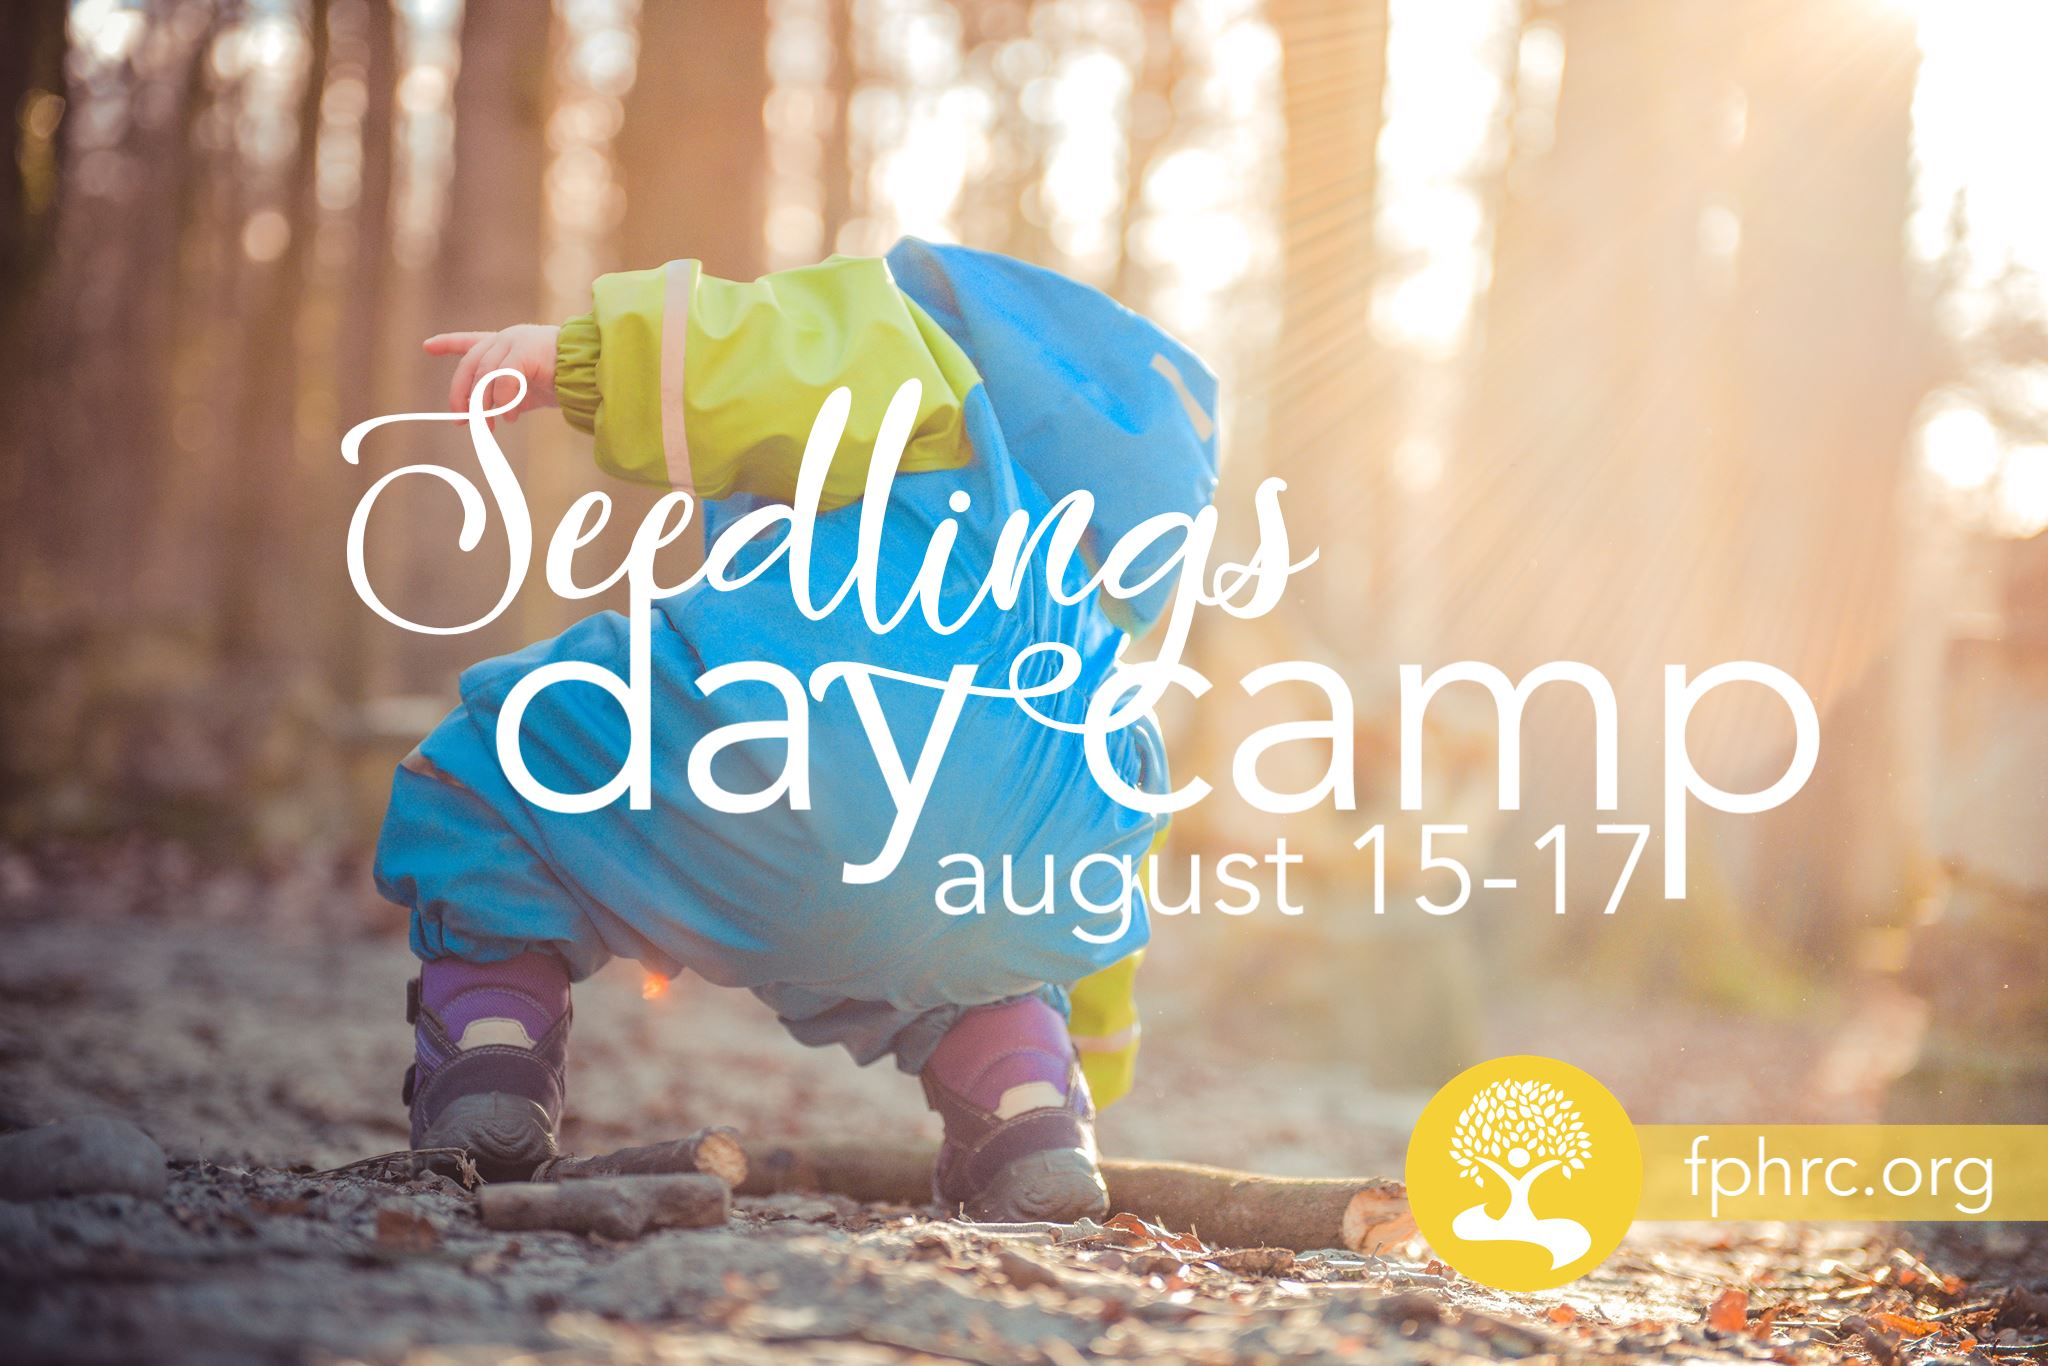 seedlings day camp.jpg